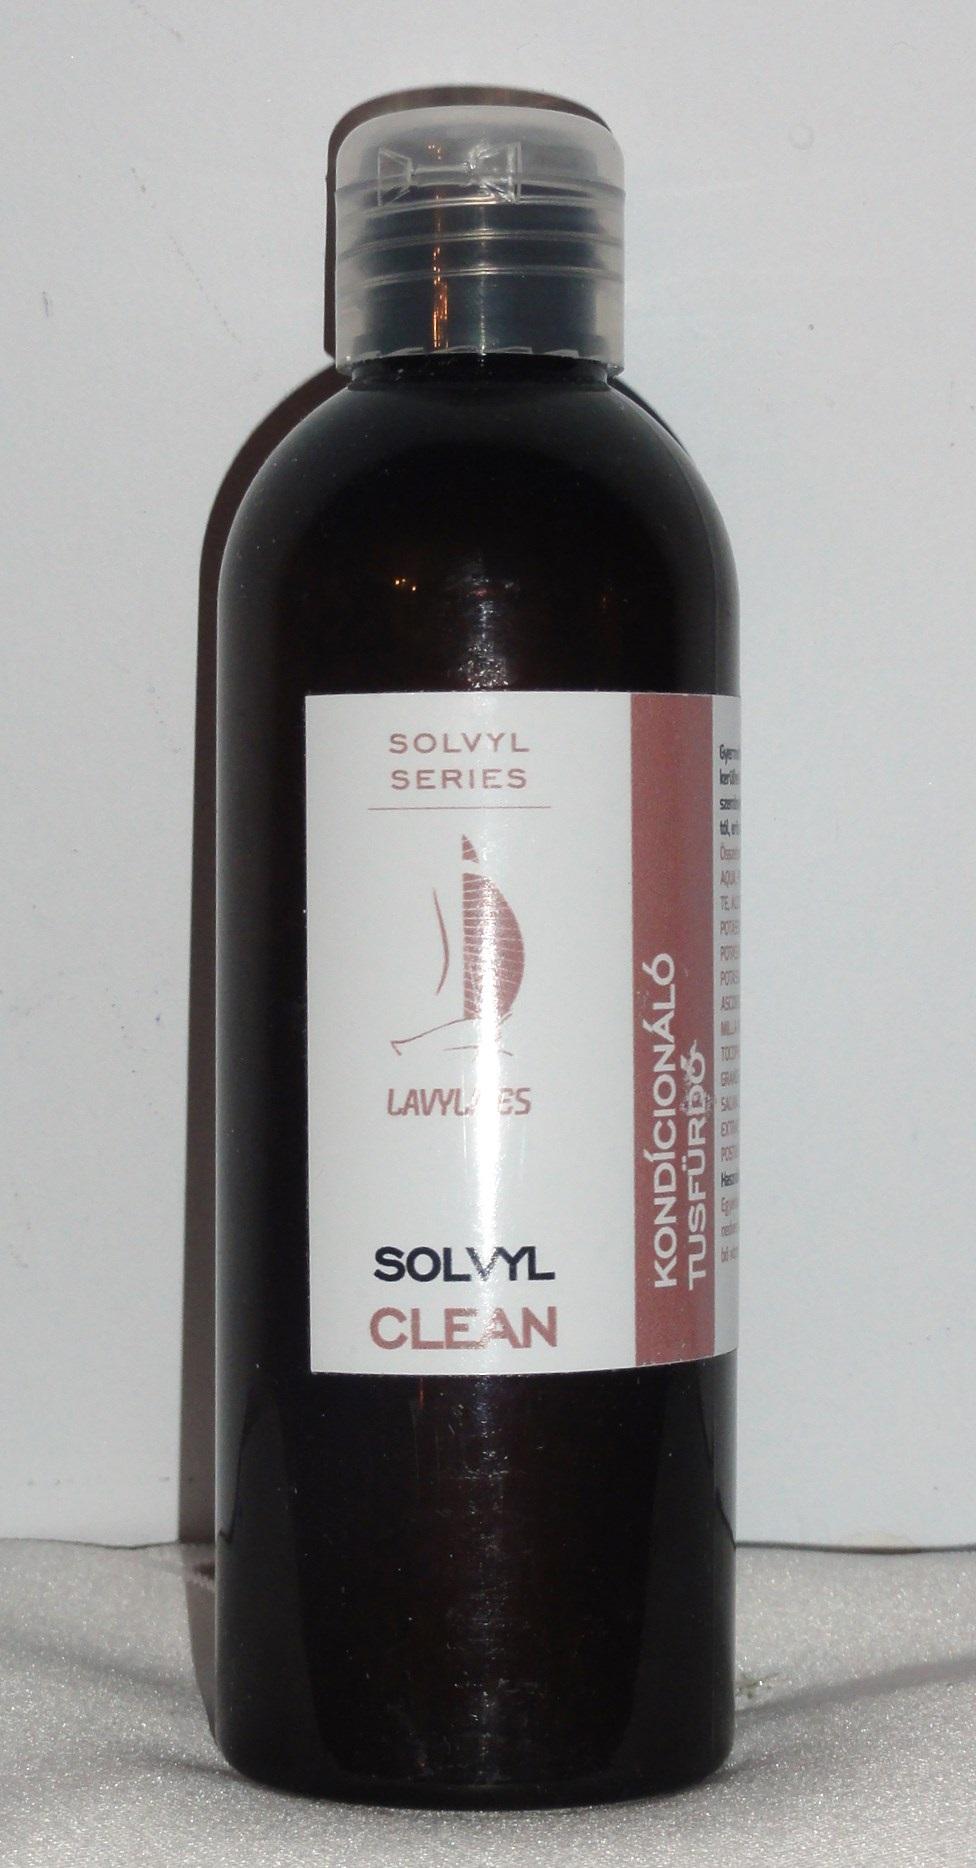 Solvyl CLEAN